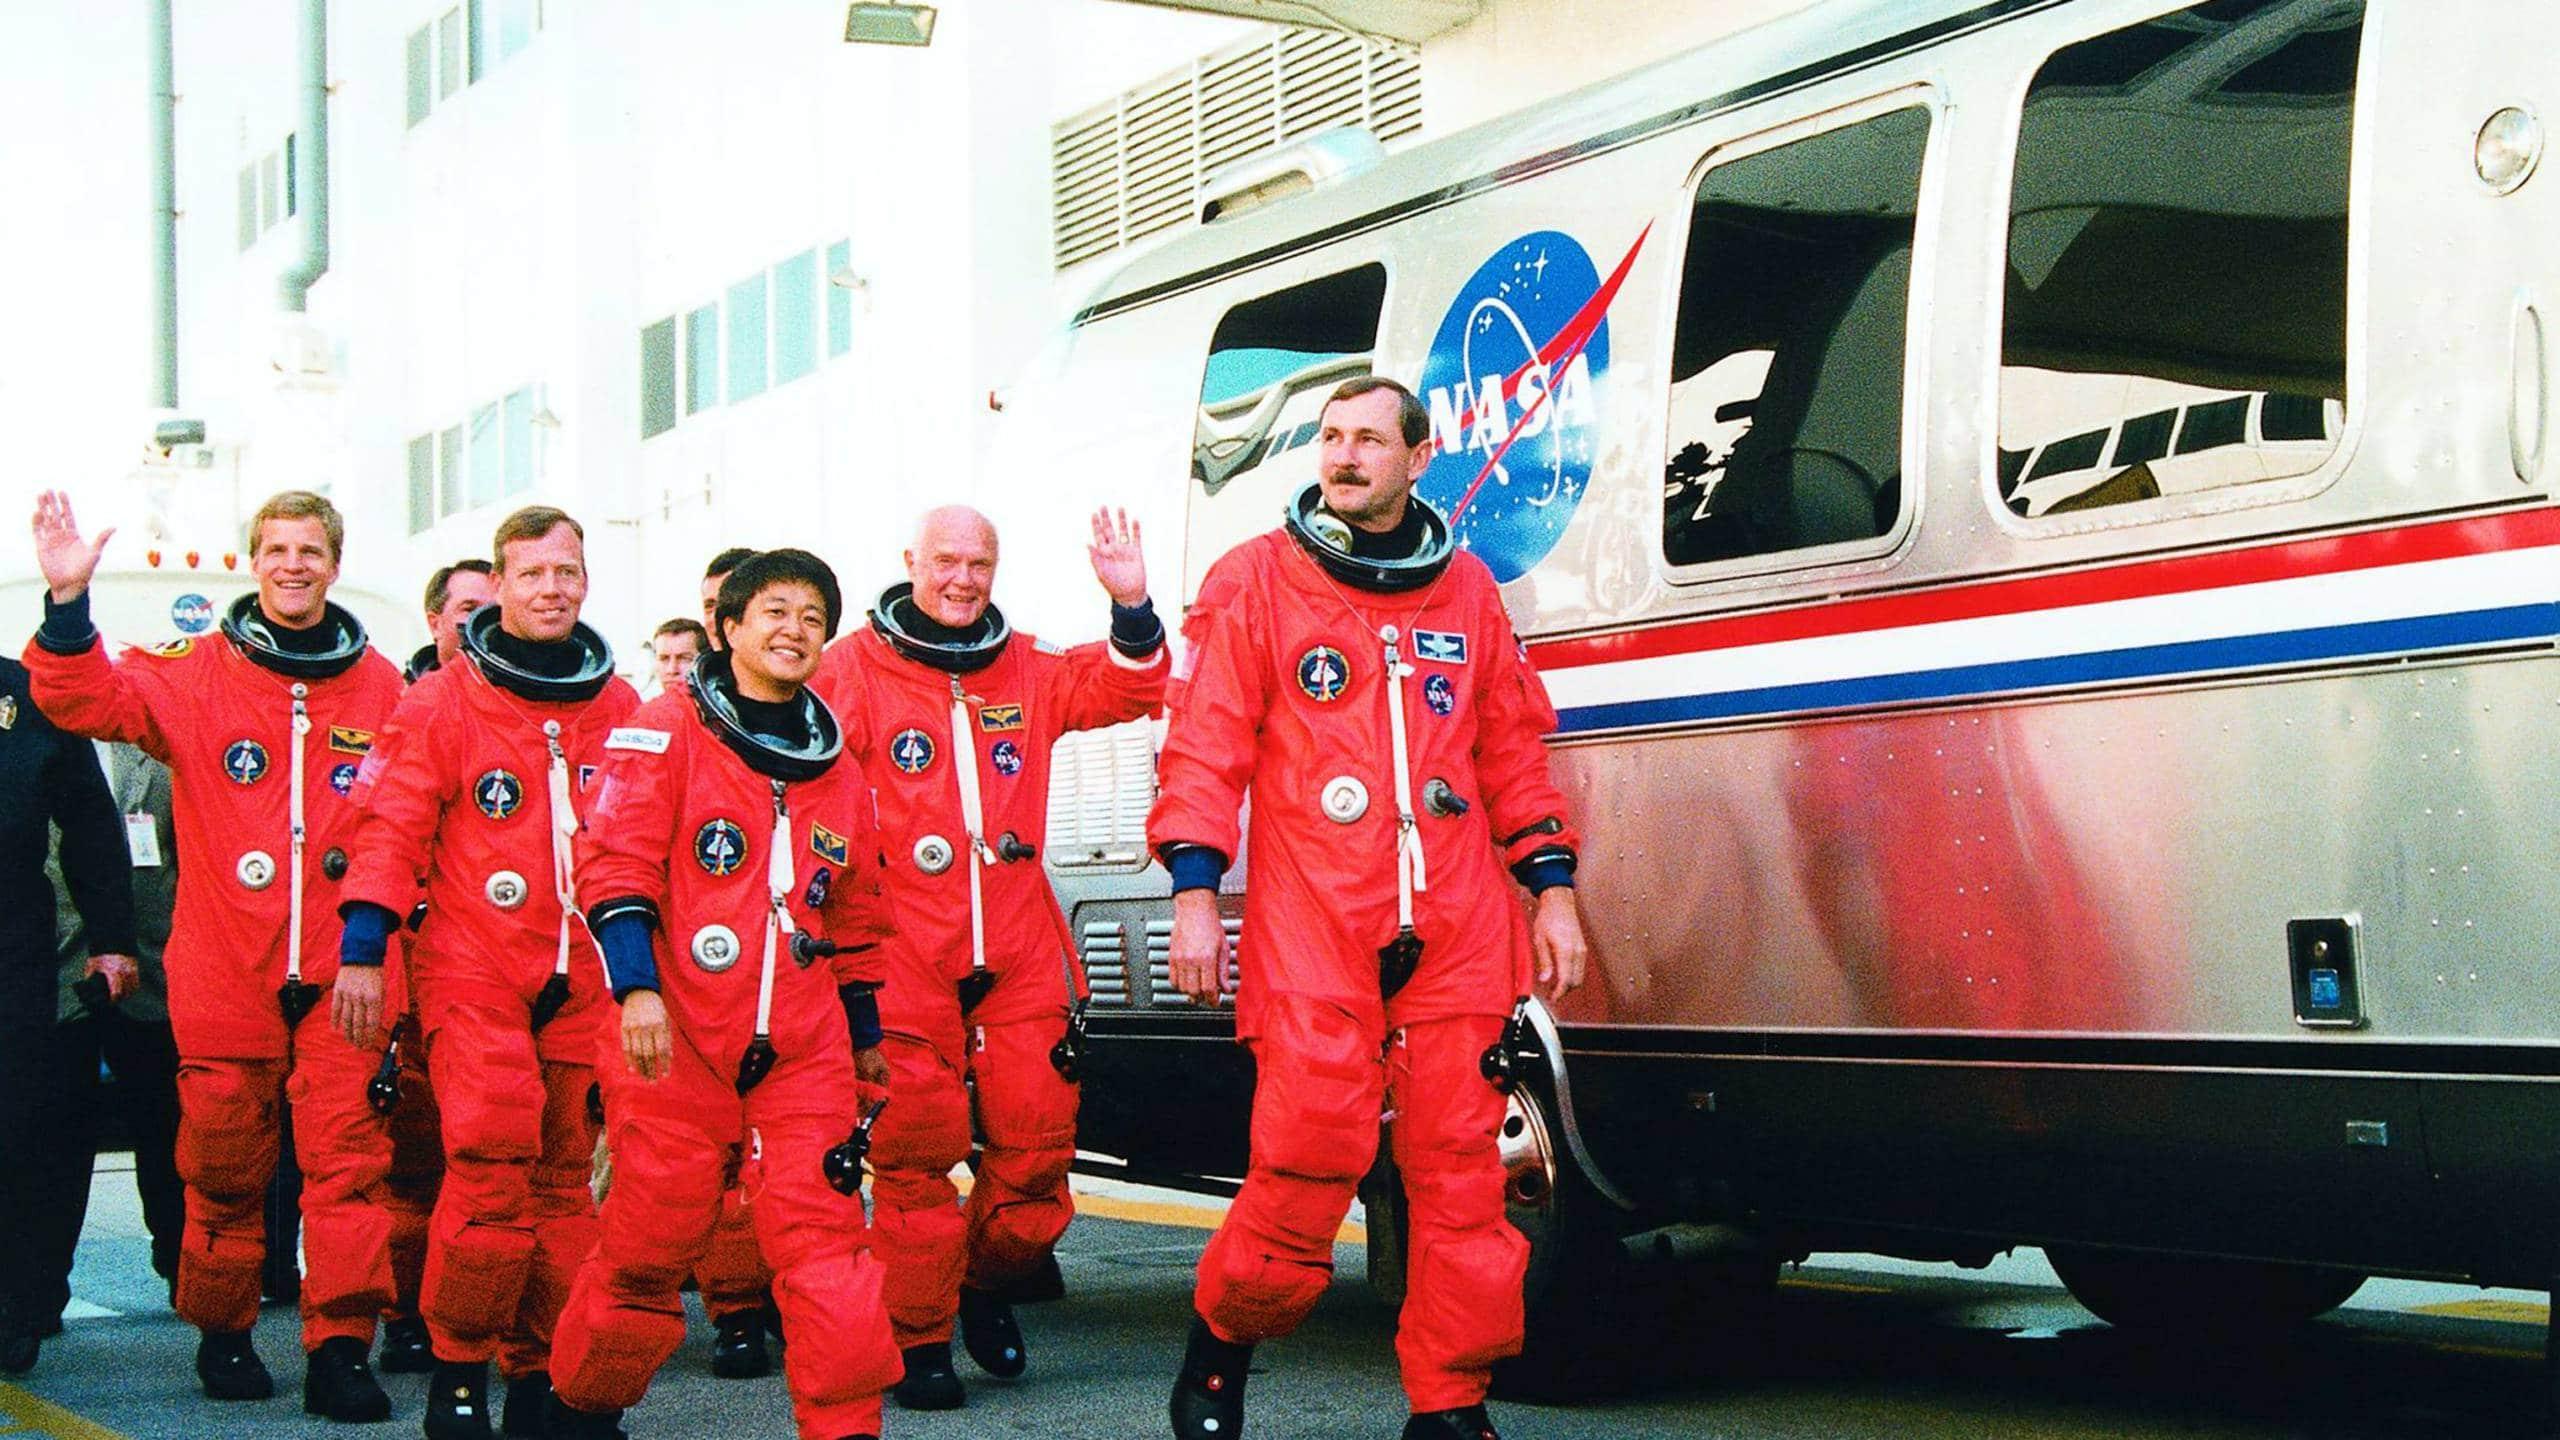 Nasa Astronauts at Quarantine AirStream